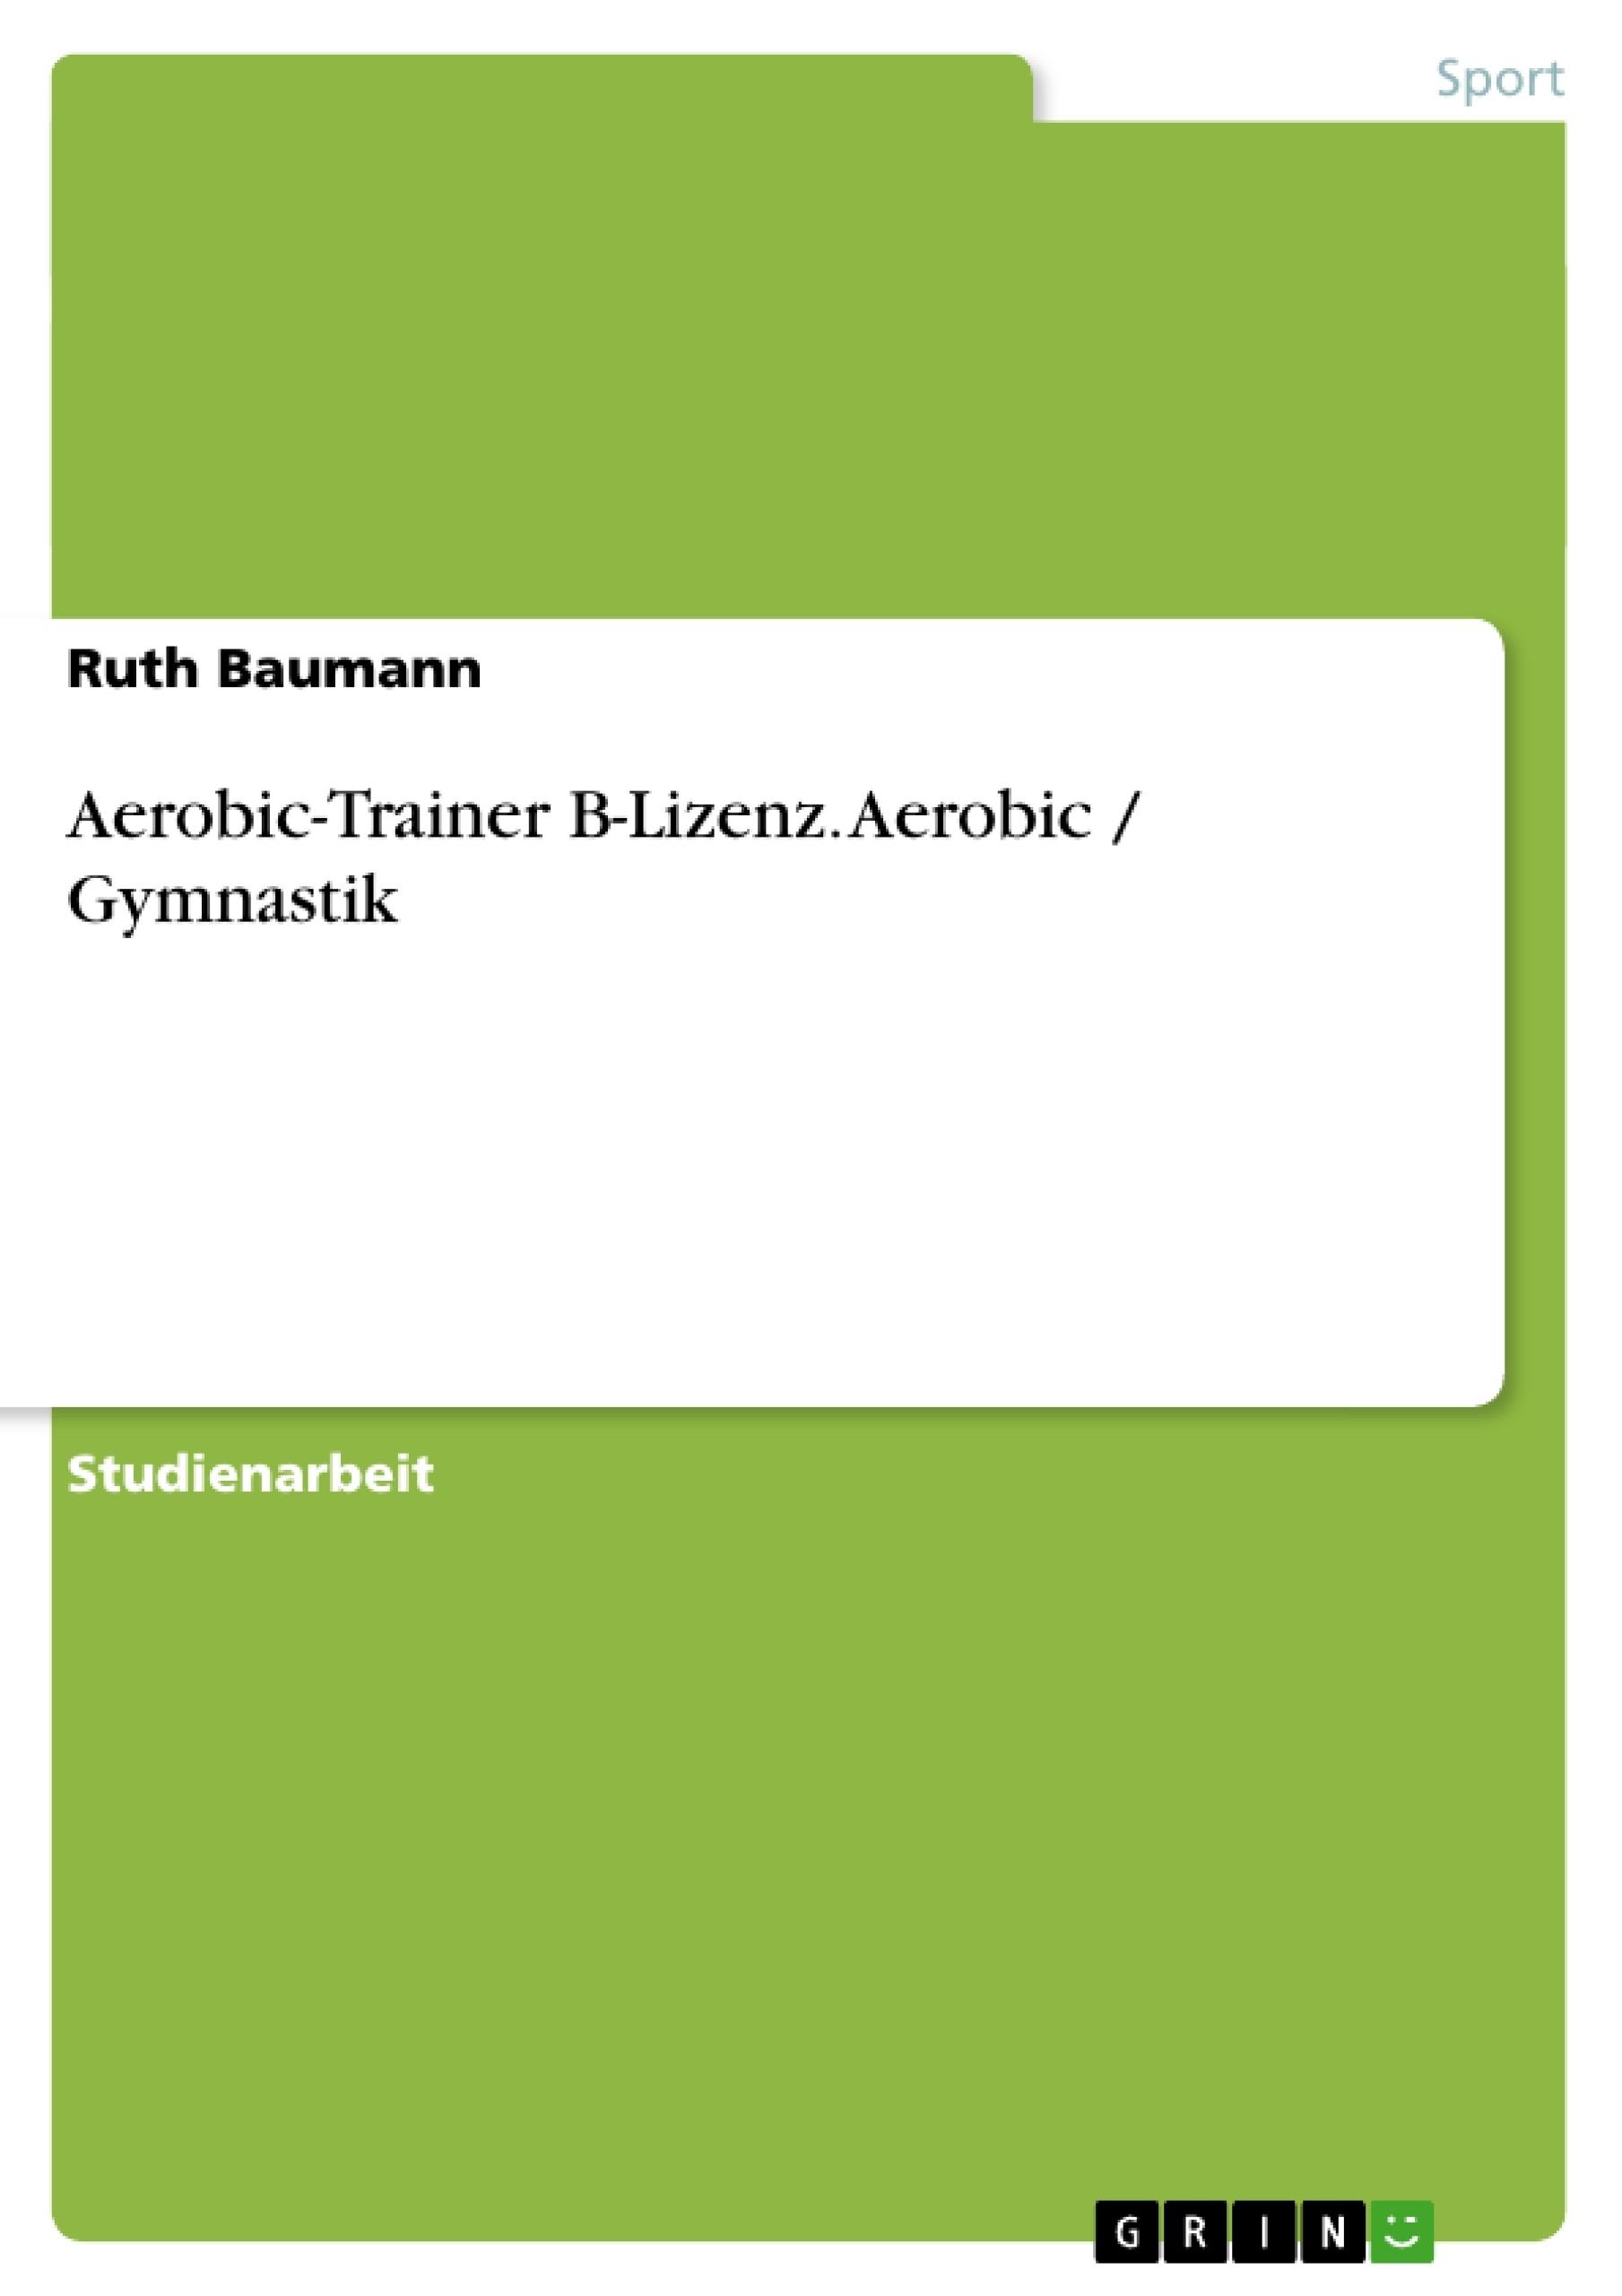 Titel: Aerobic-Trainer B-Lizenz.  Aerobic / Gymnastik